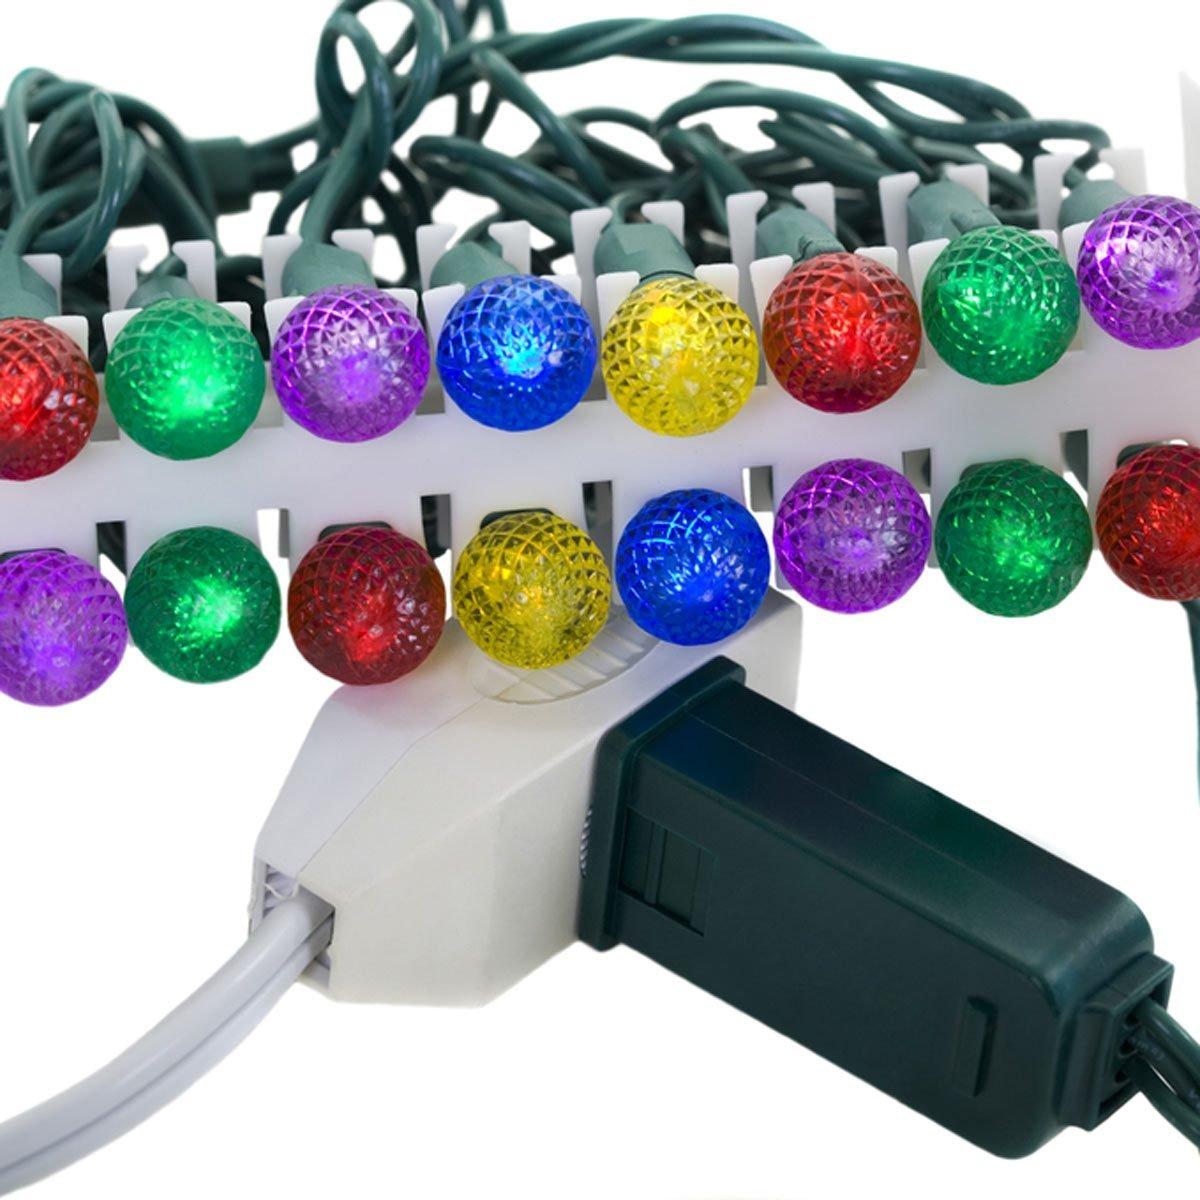 lessoutlets_42962275_05 LED christmas lights